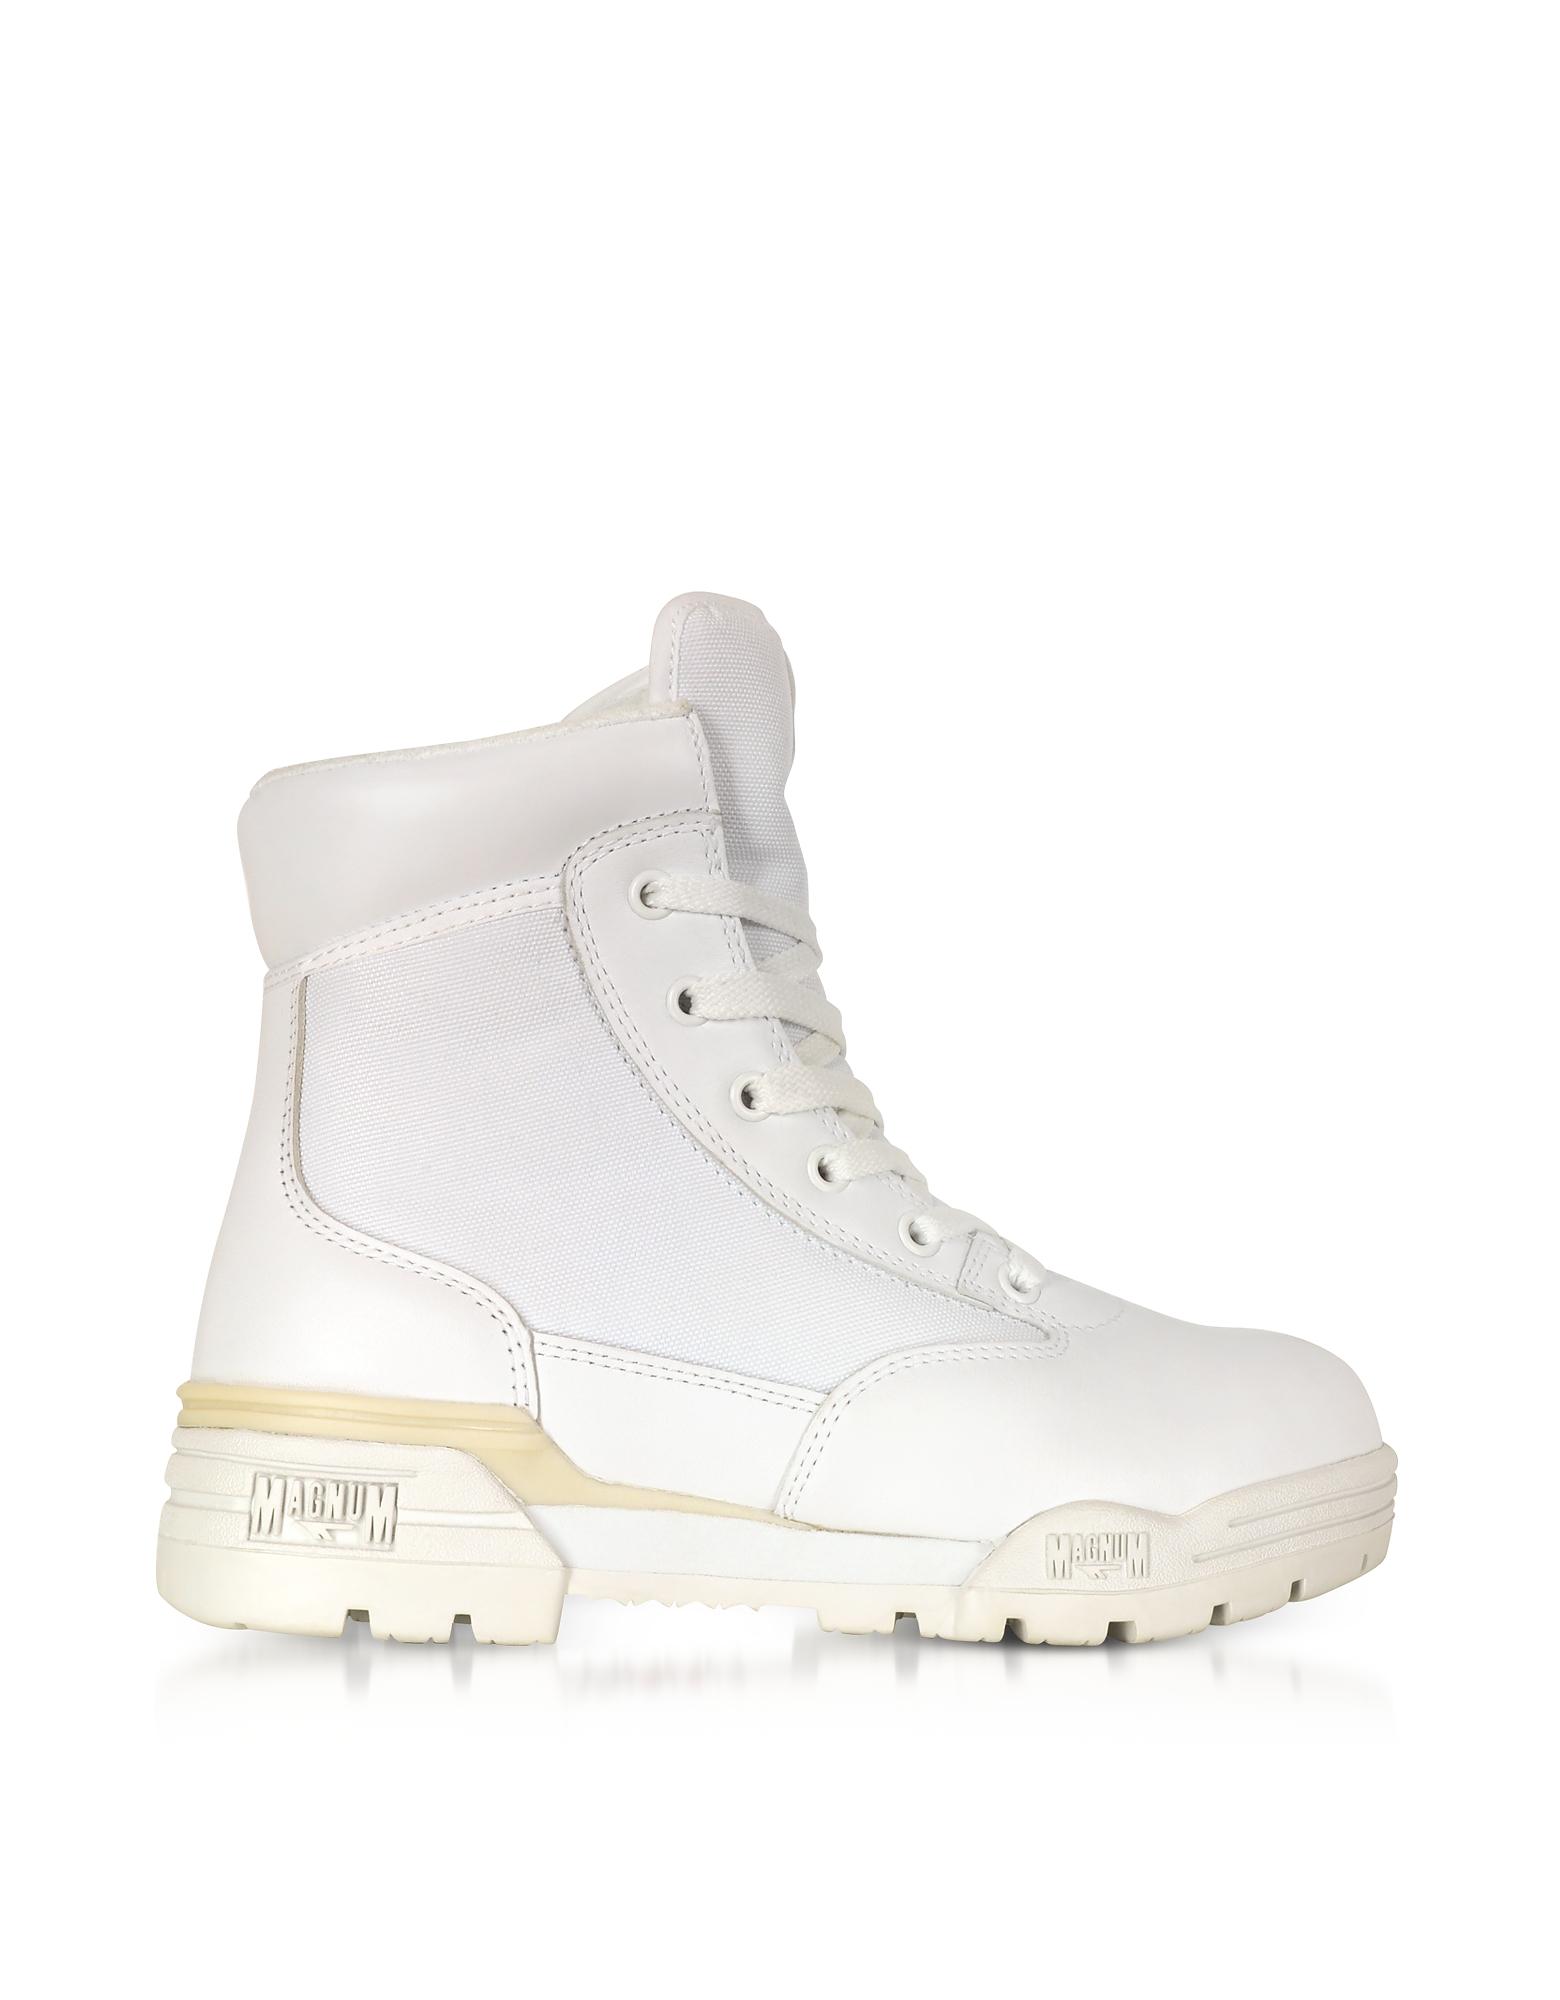 Image of Hi-Tec Designer Shoes, Hi-Tec Magnum 6 Classic Lux White Mesh and Leather Women's Boots